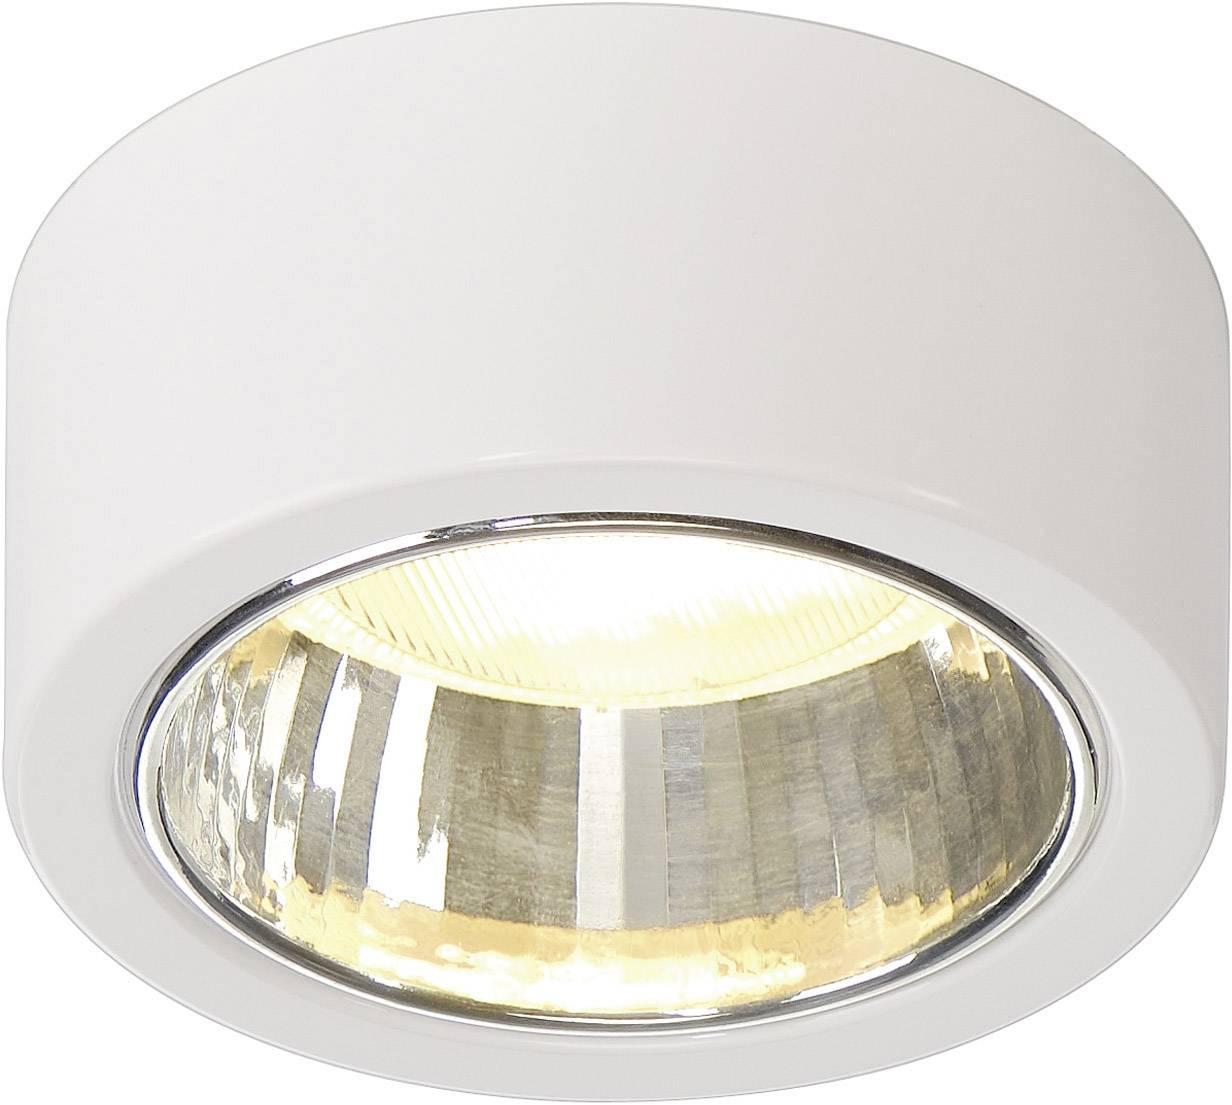 Stropní svítidlo úsporná žárovka SLV CL 101 112281, GX53, 11 W, bílá